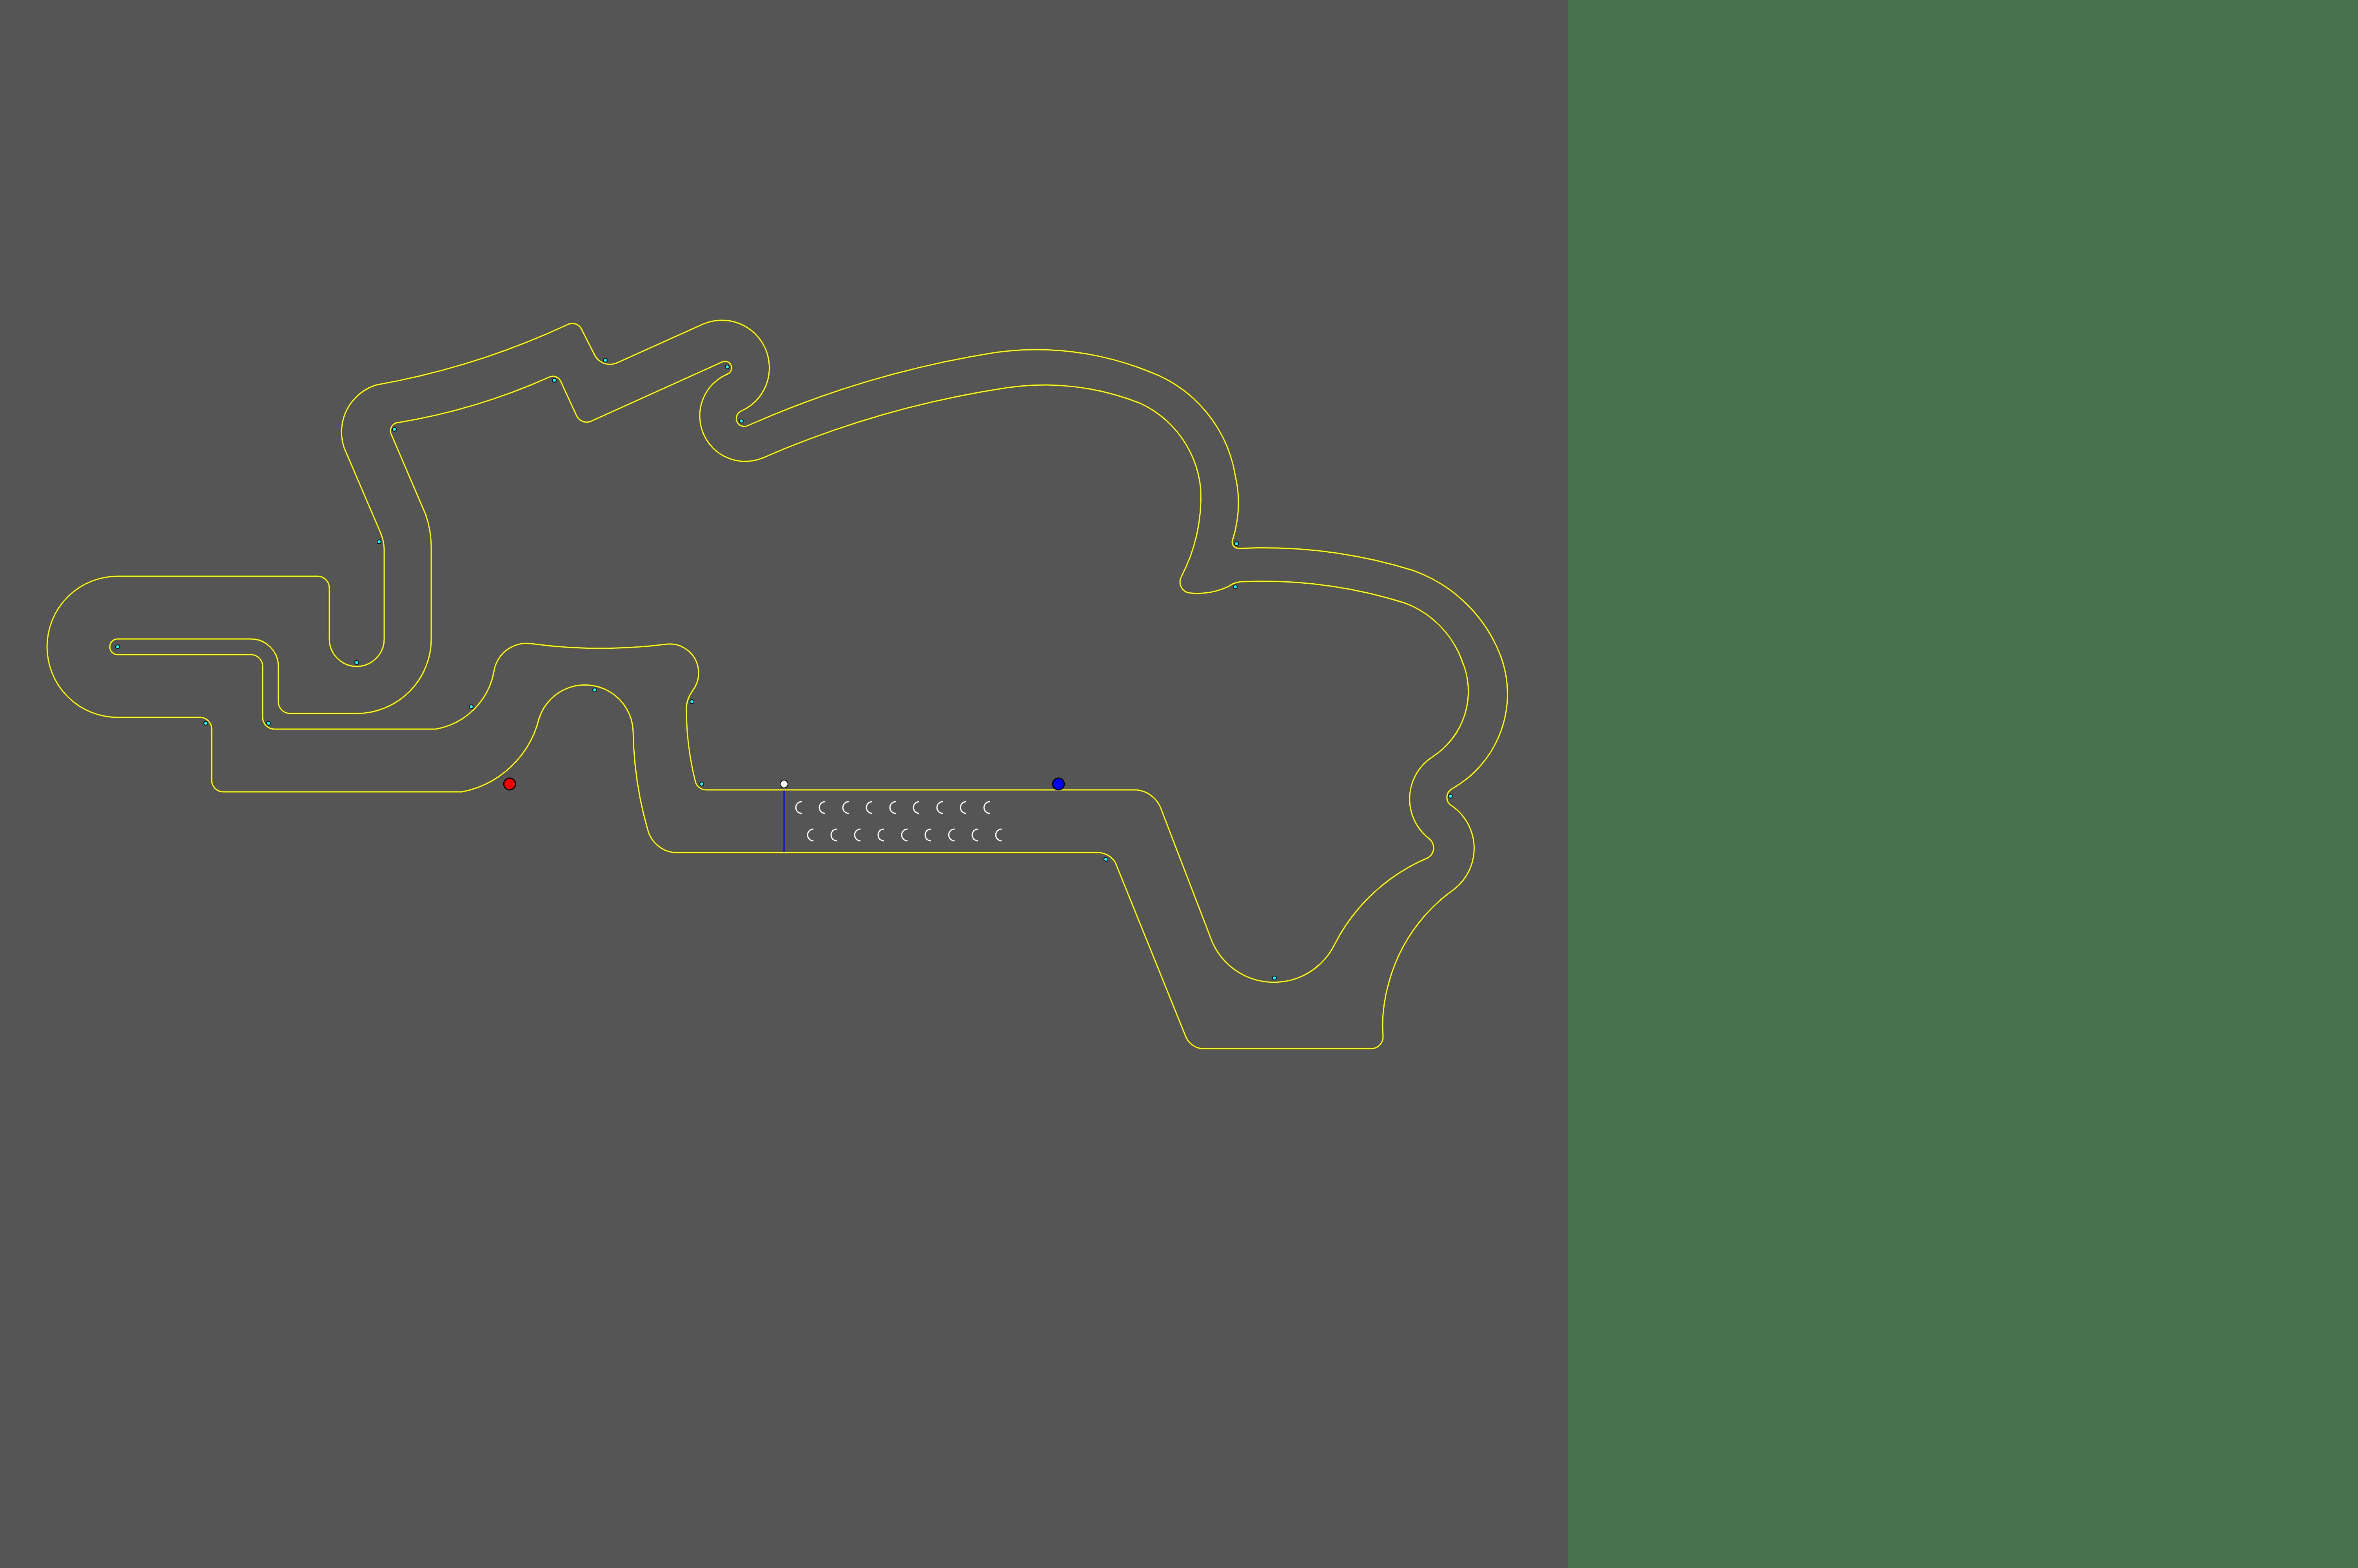 hax ball maps | Race Track - 8 by Galactic Boy